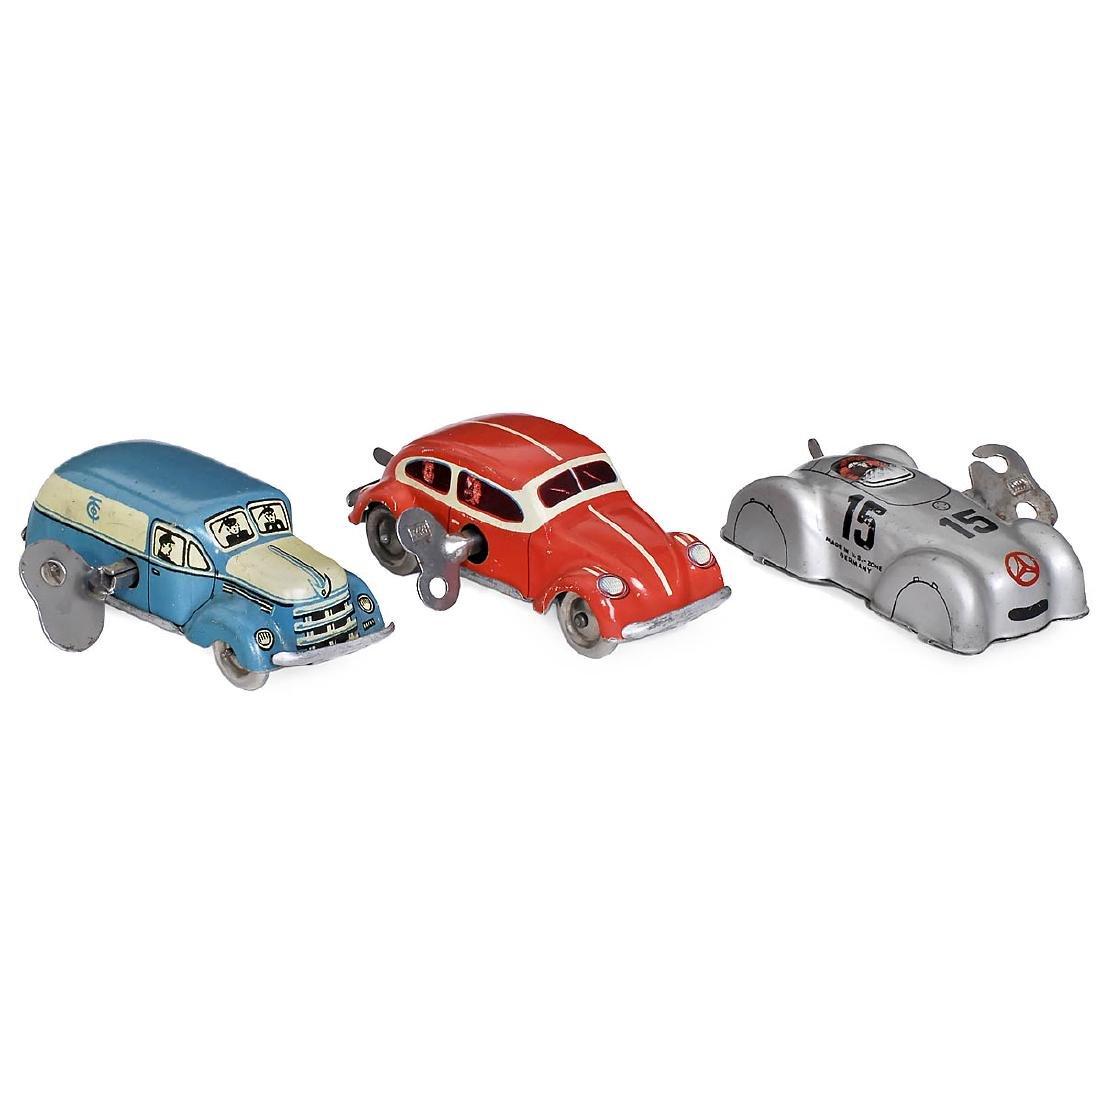 3 Tippco Cars, c. 1950